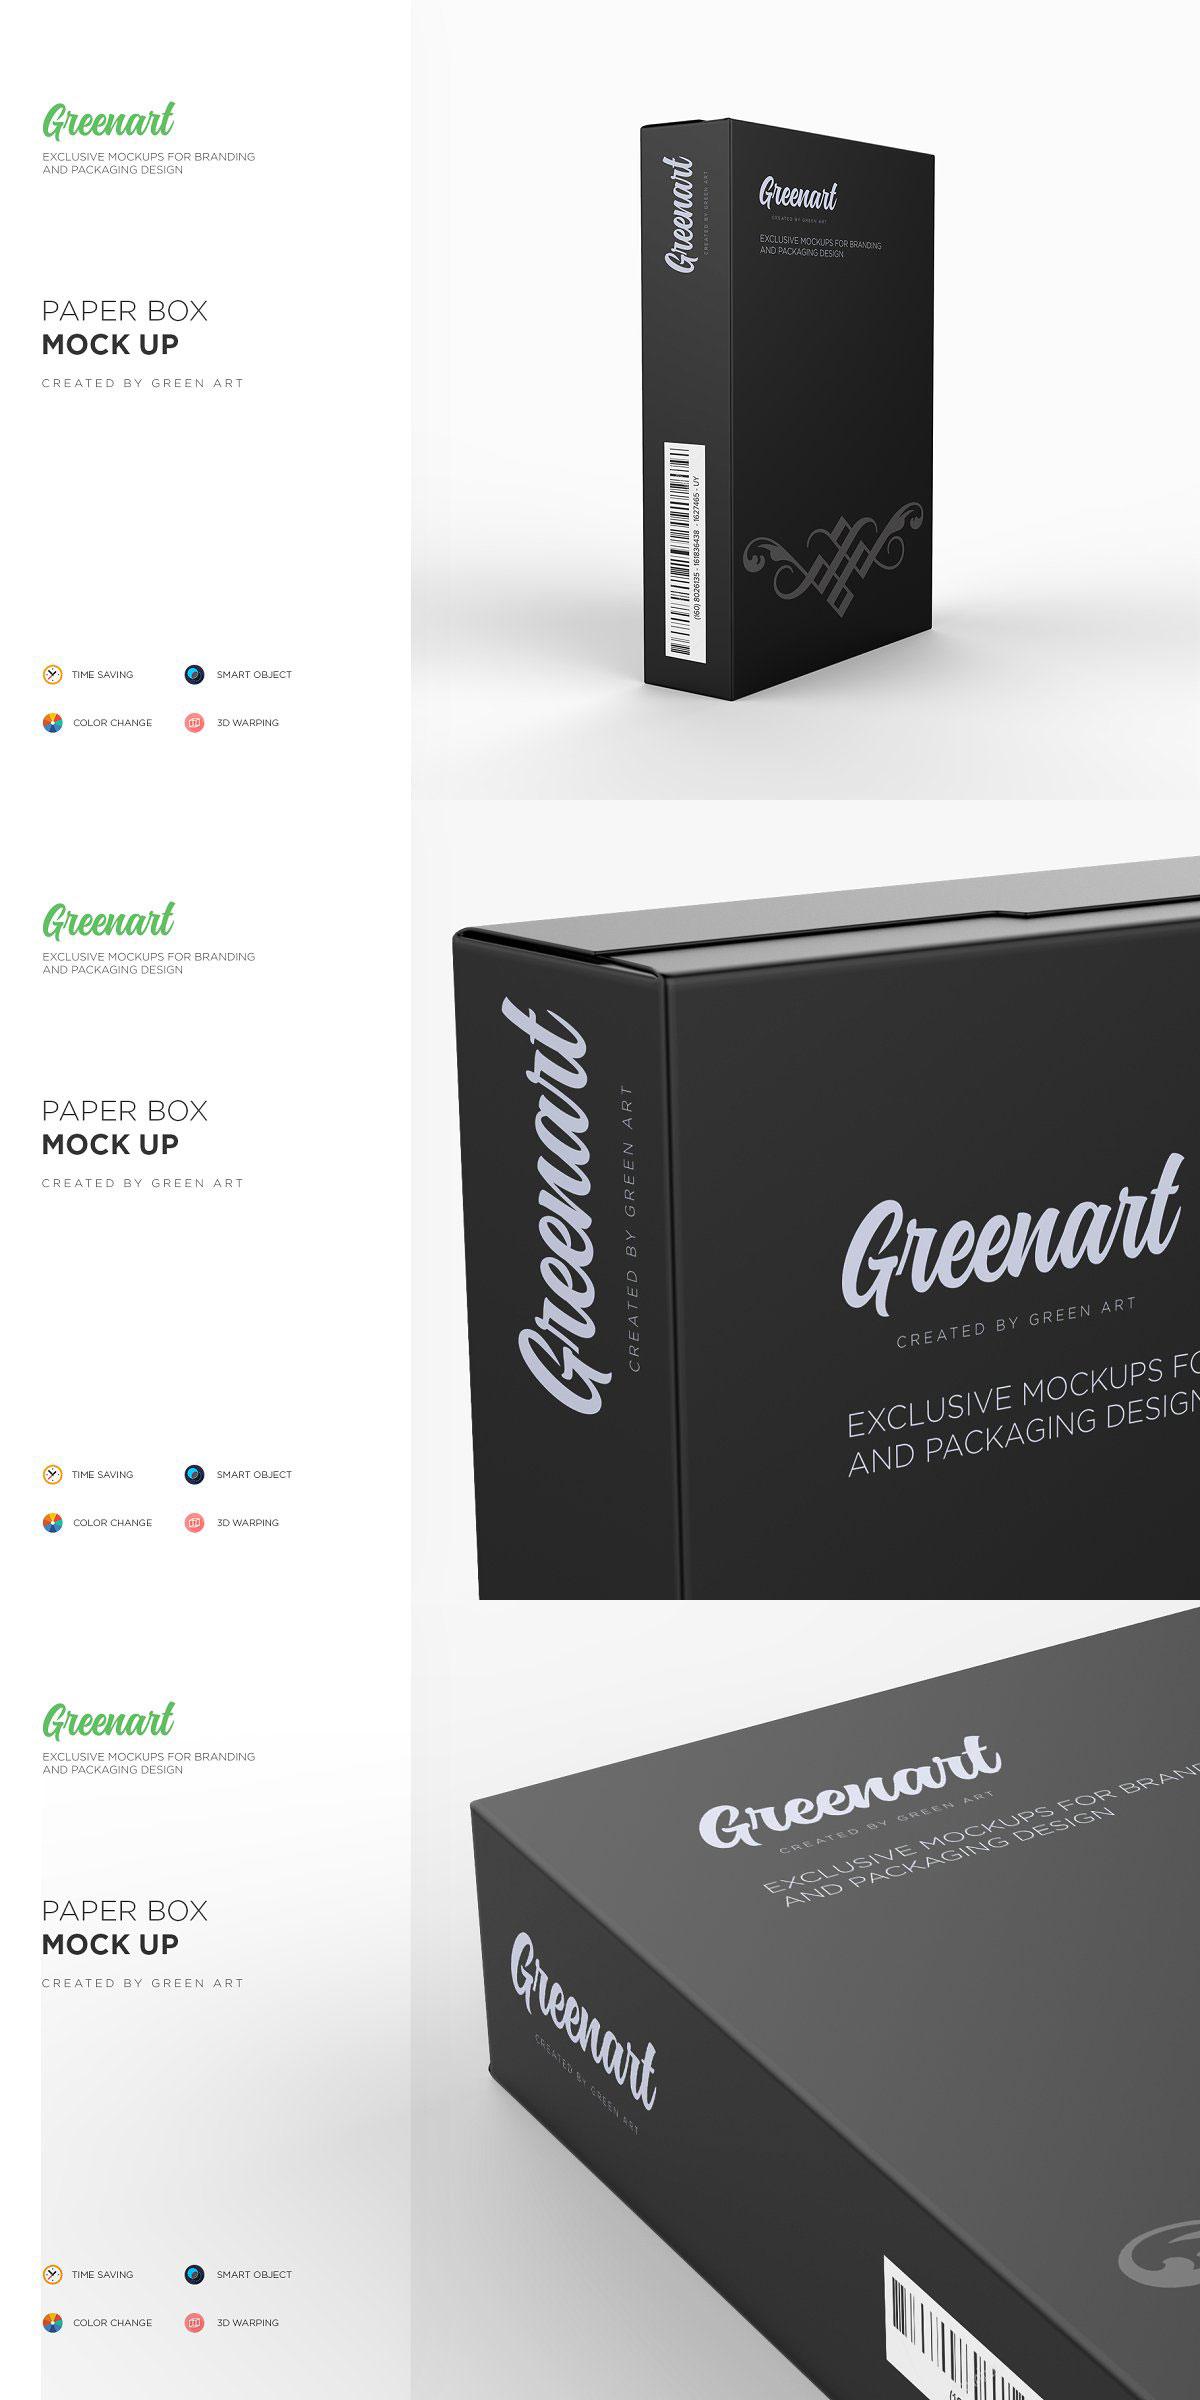 Paper Box Mockup 2651457 Free Download